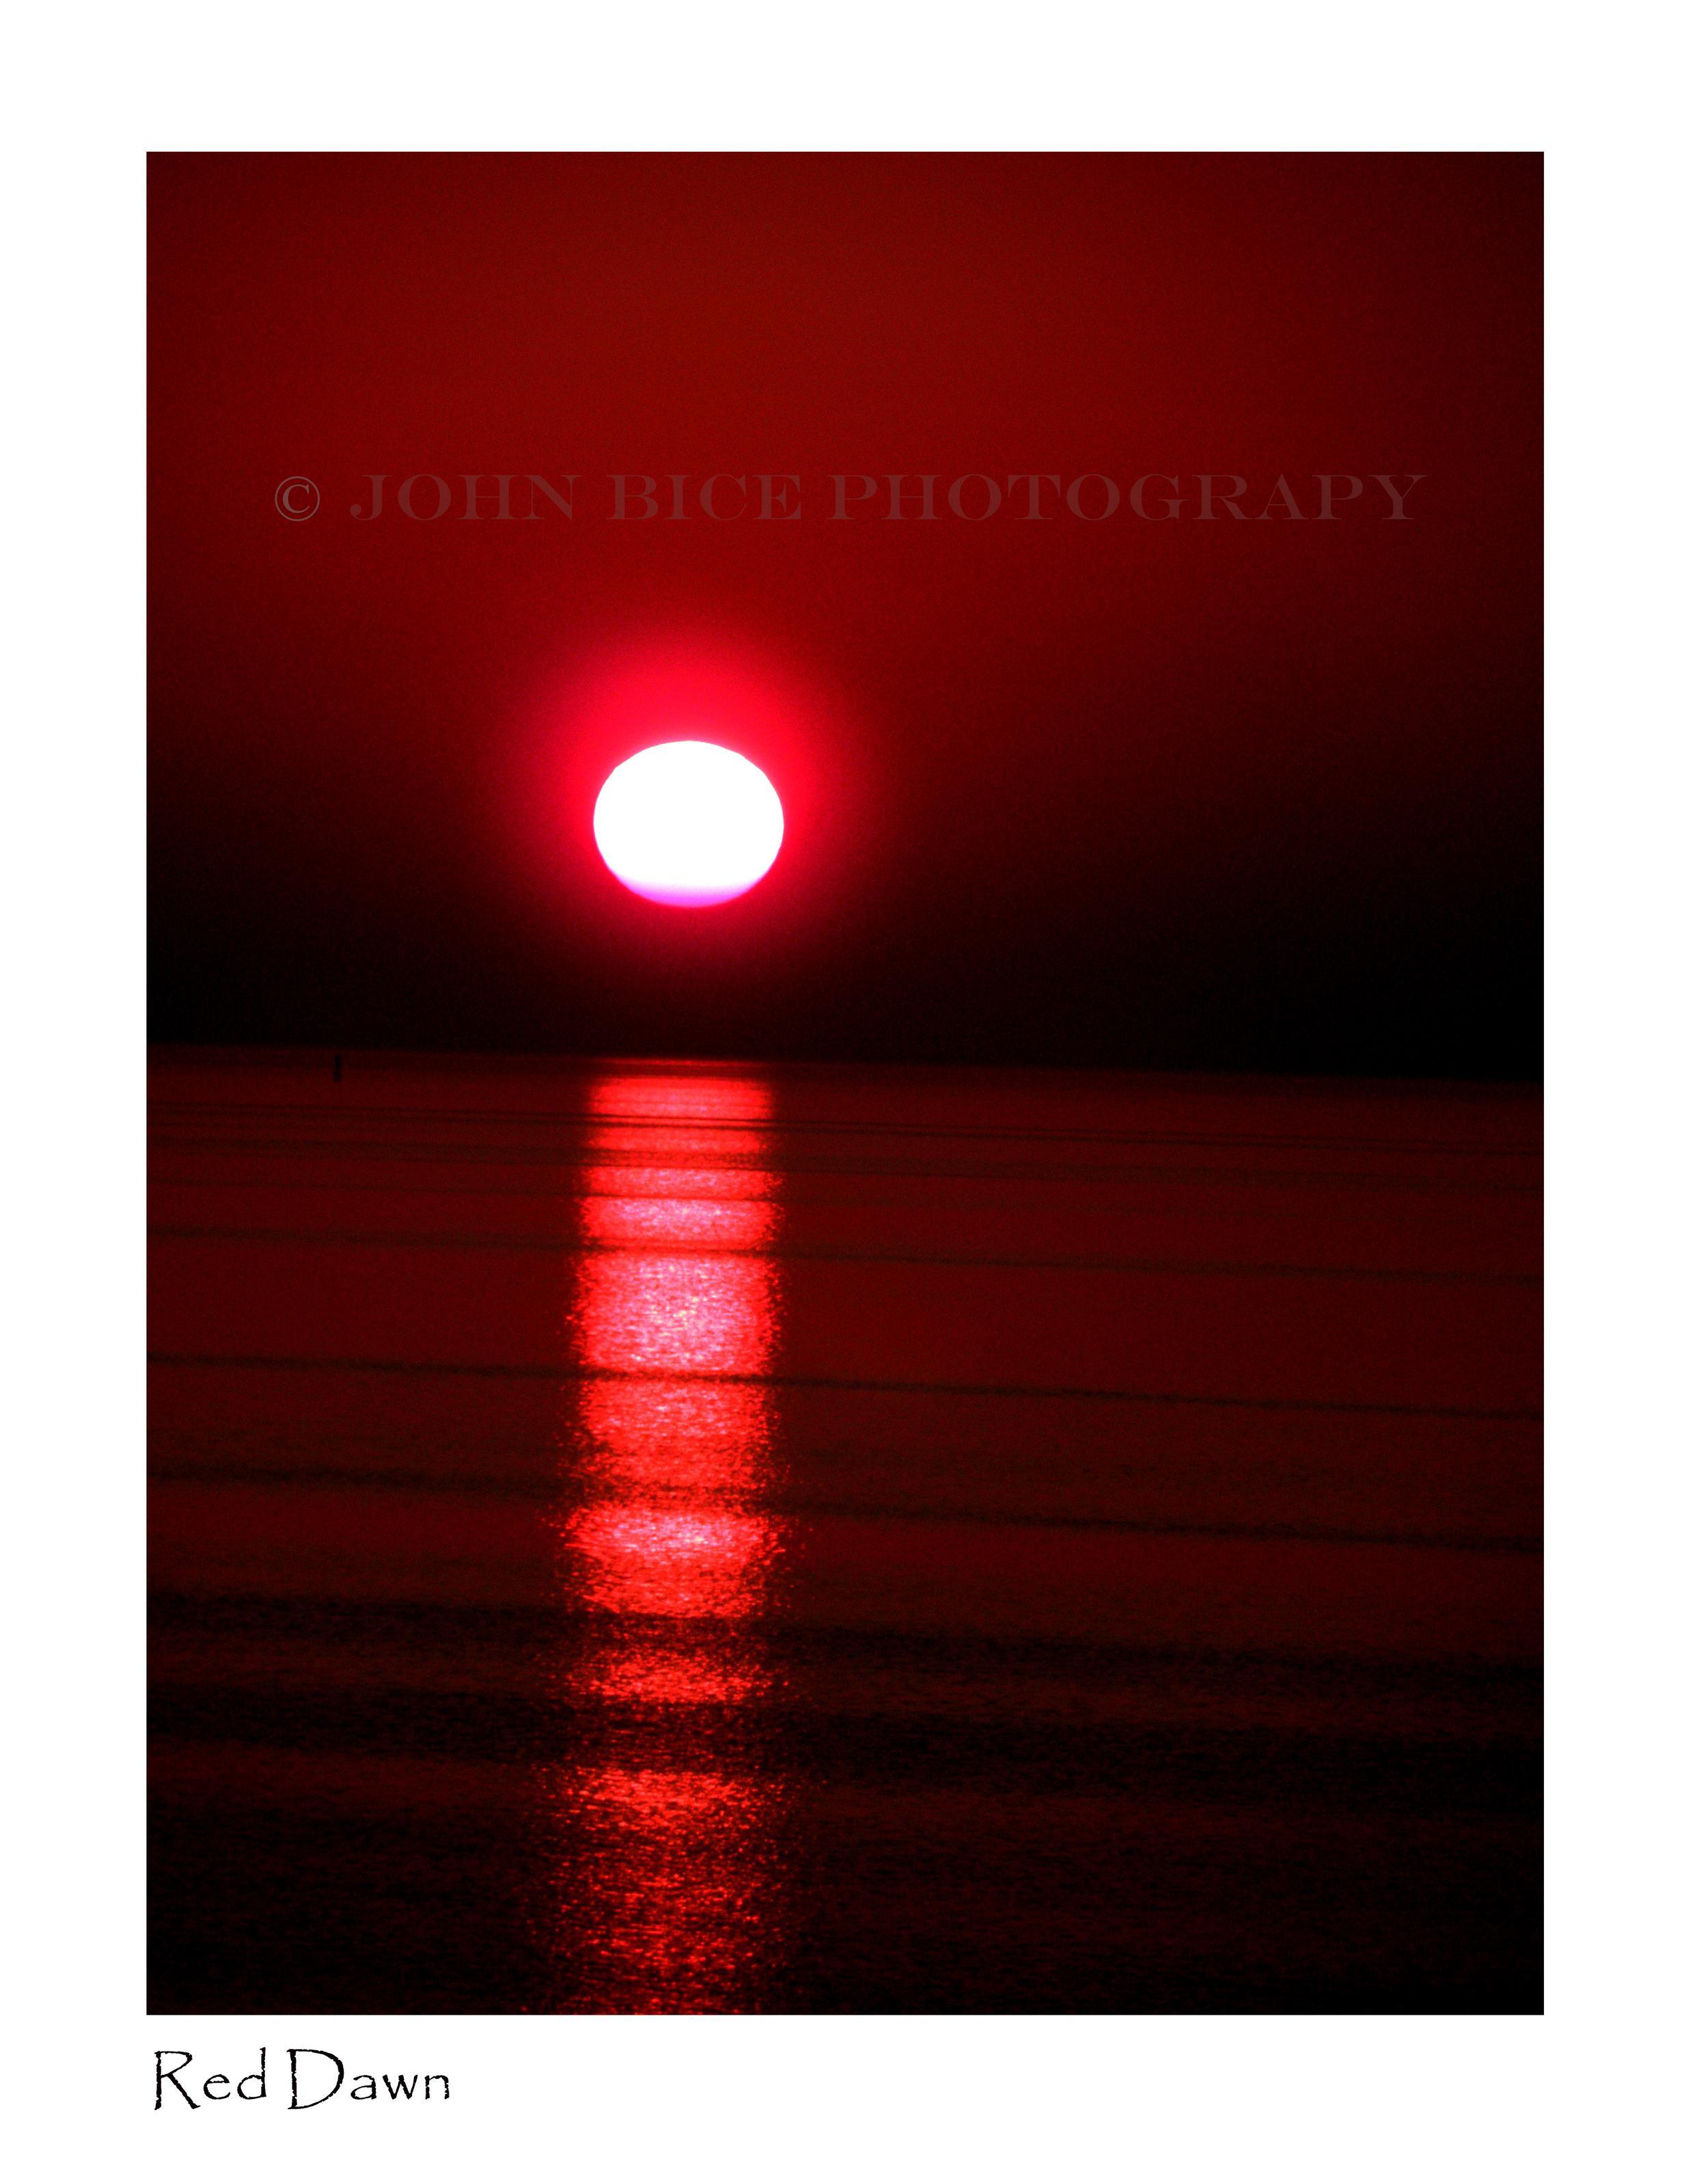 Red Dawn Contrast.jpg